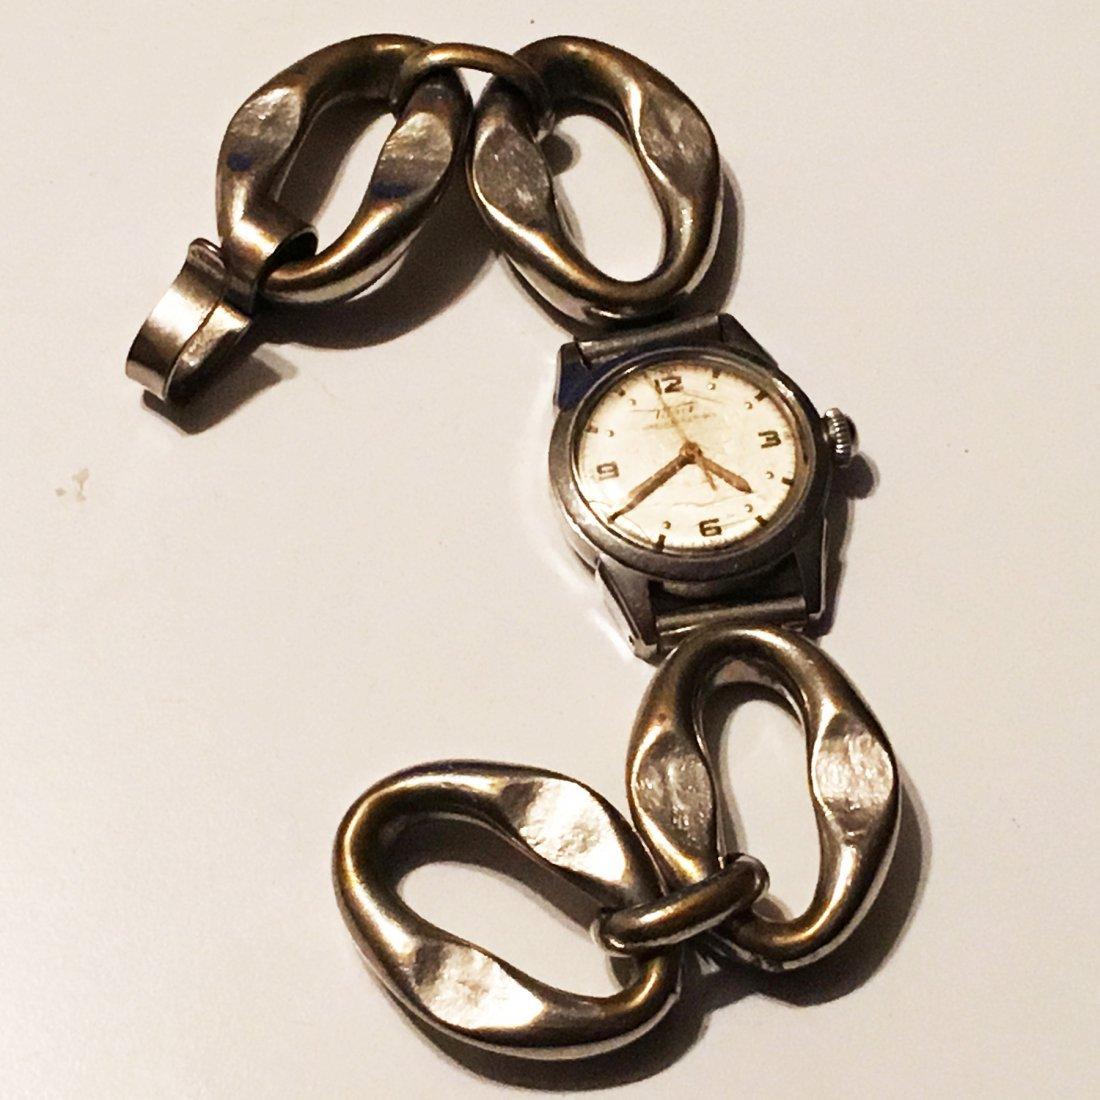 Tissot Swiss Antimagnetique watch